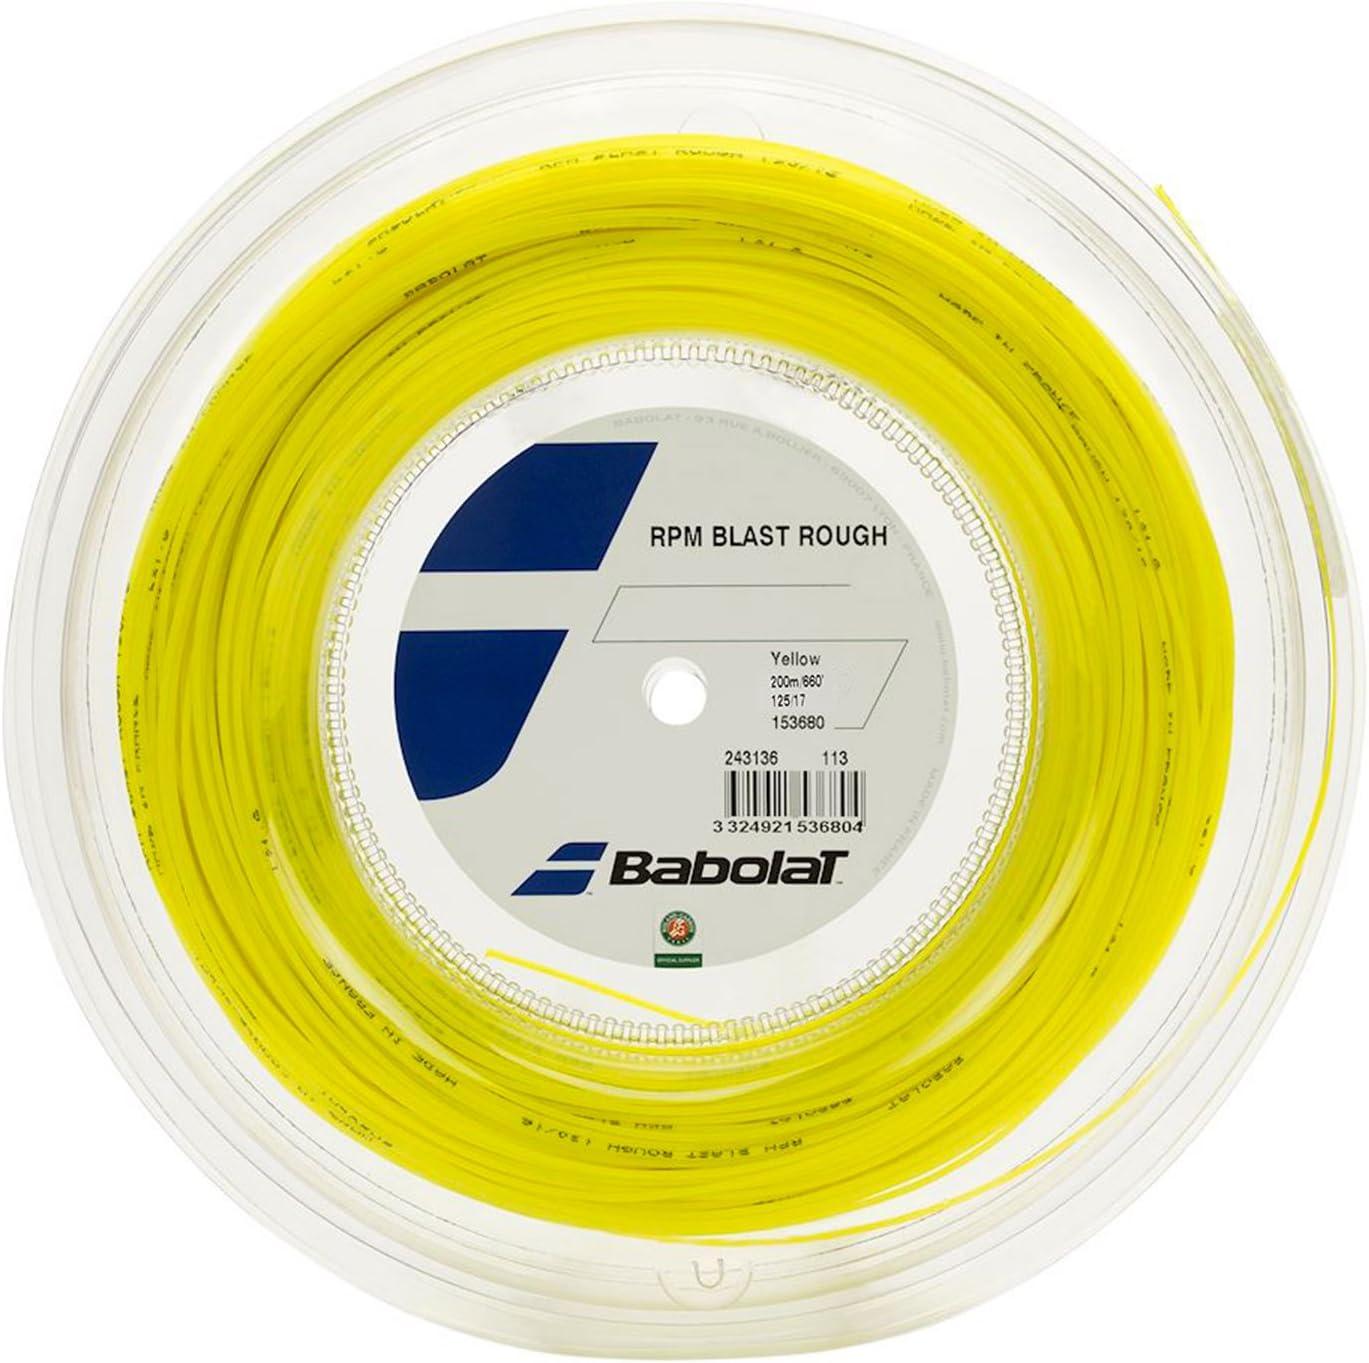 Unisex Adulto Babolat RPM Blast Rough 200m Cordaje de Tenis